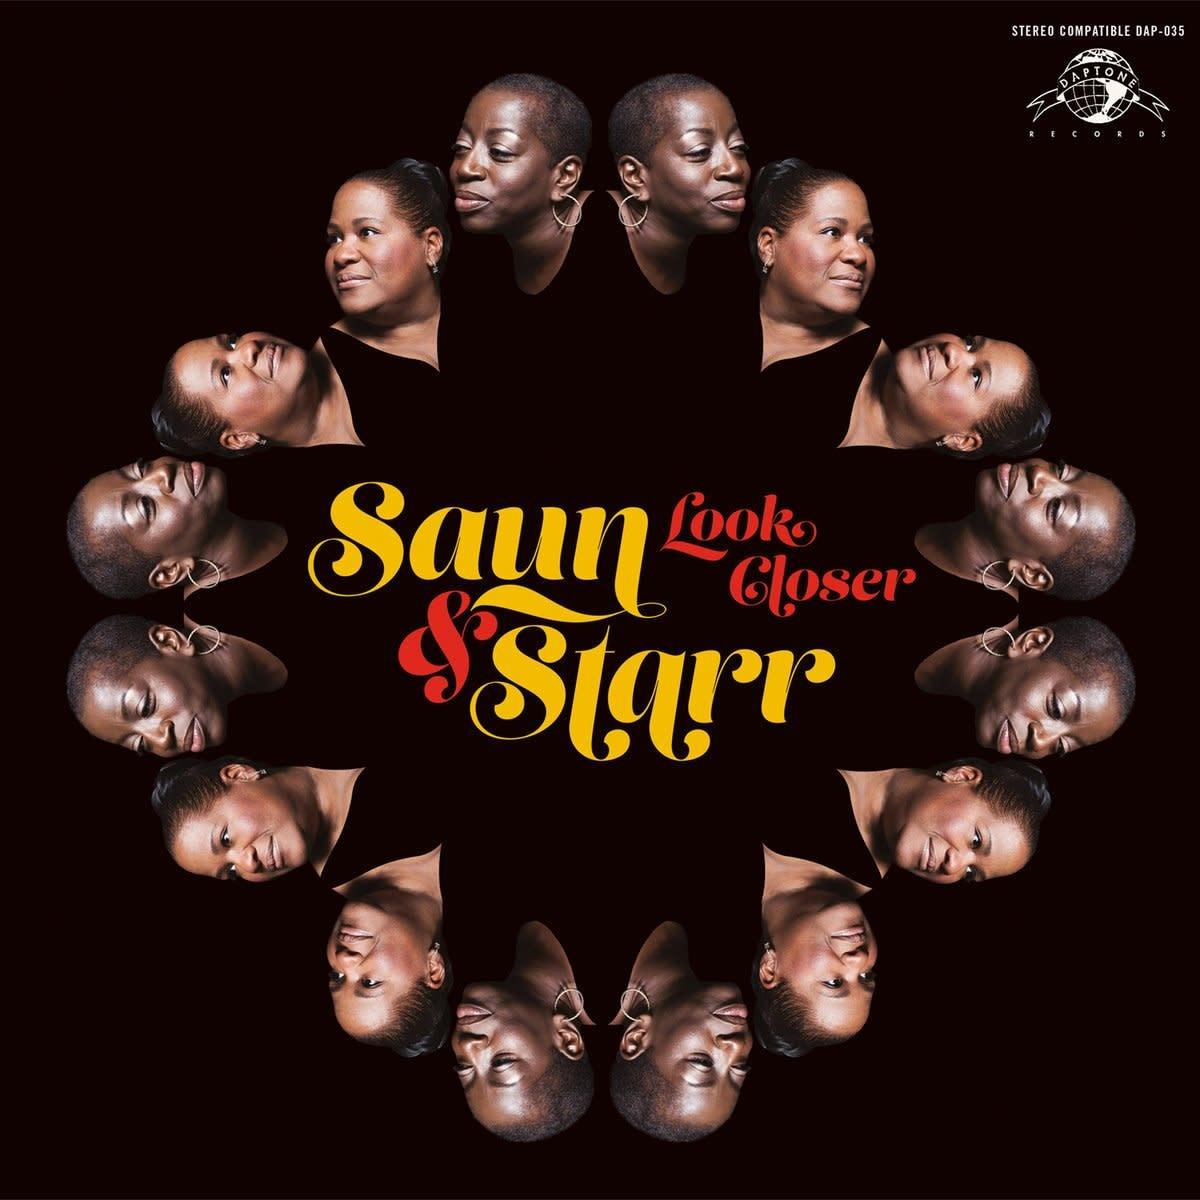 Saun & Starr • Look Closer-1